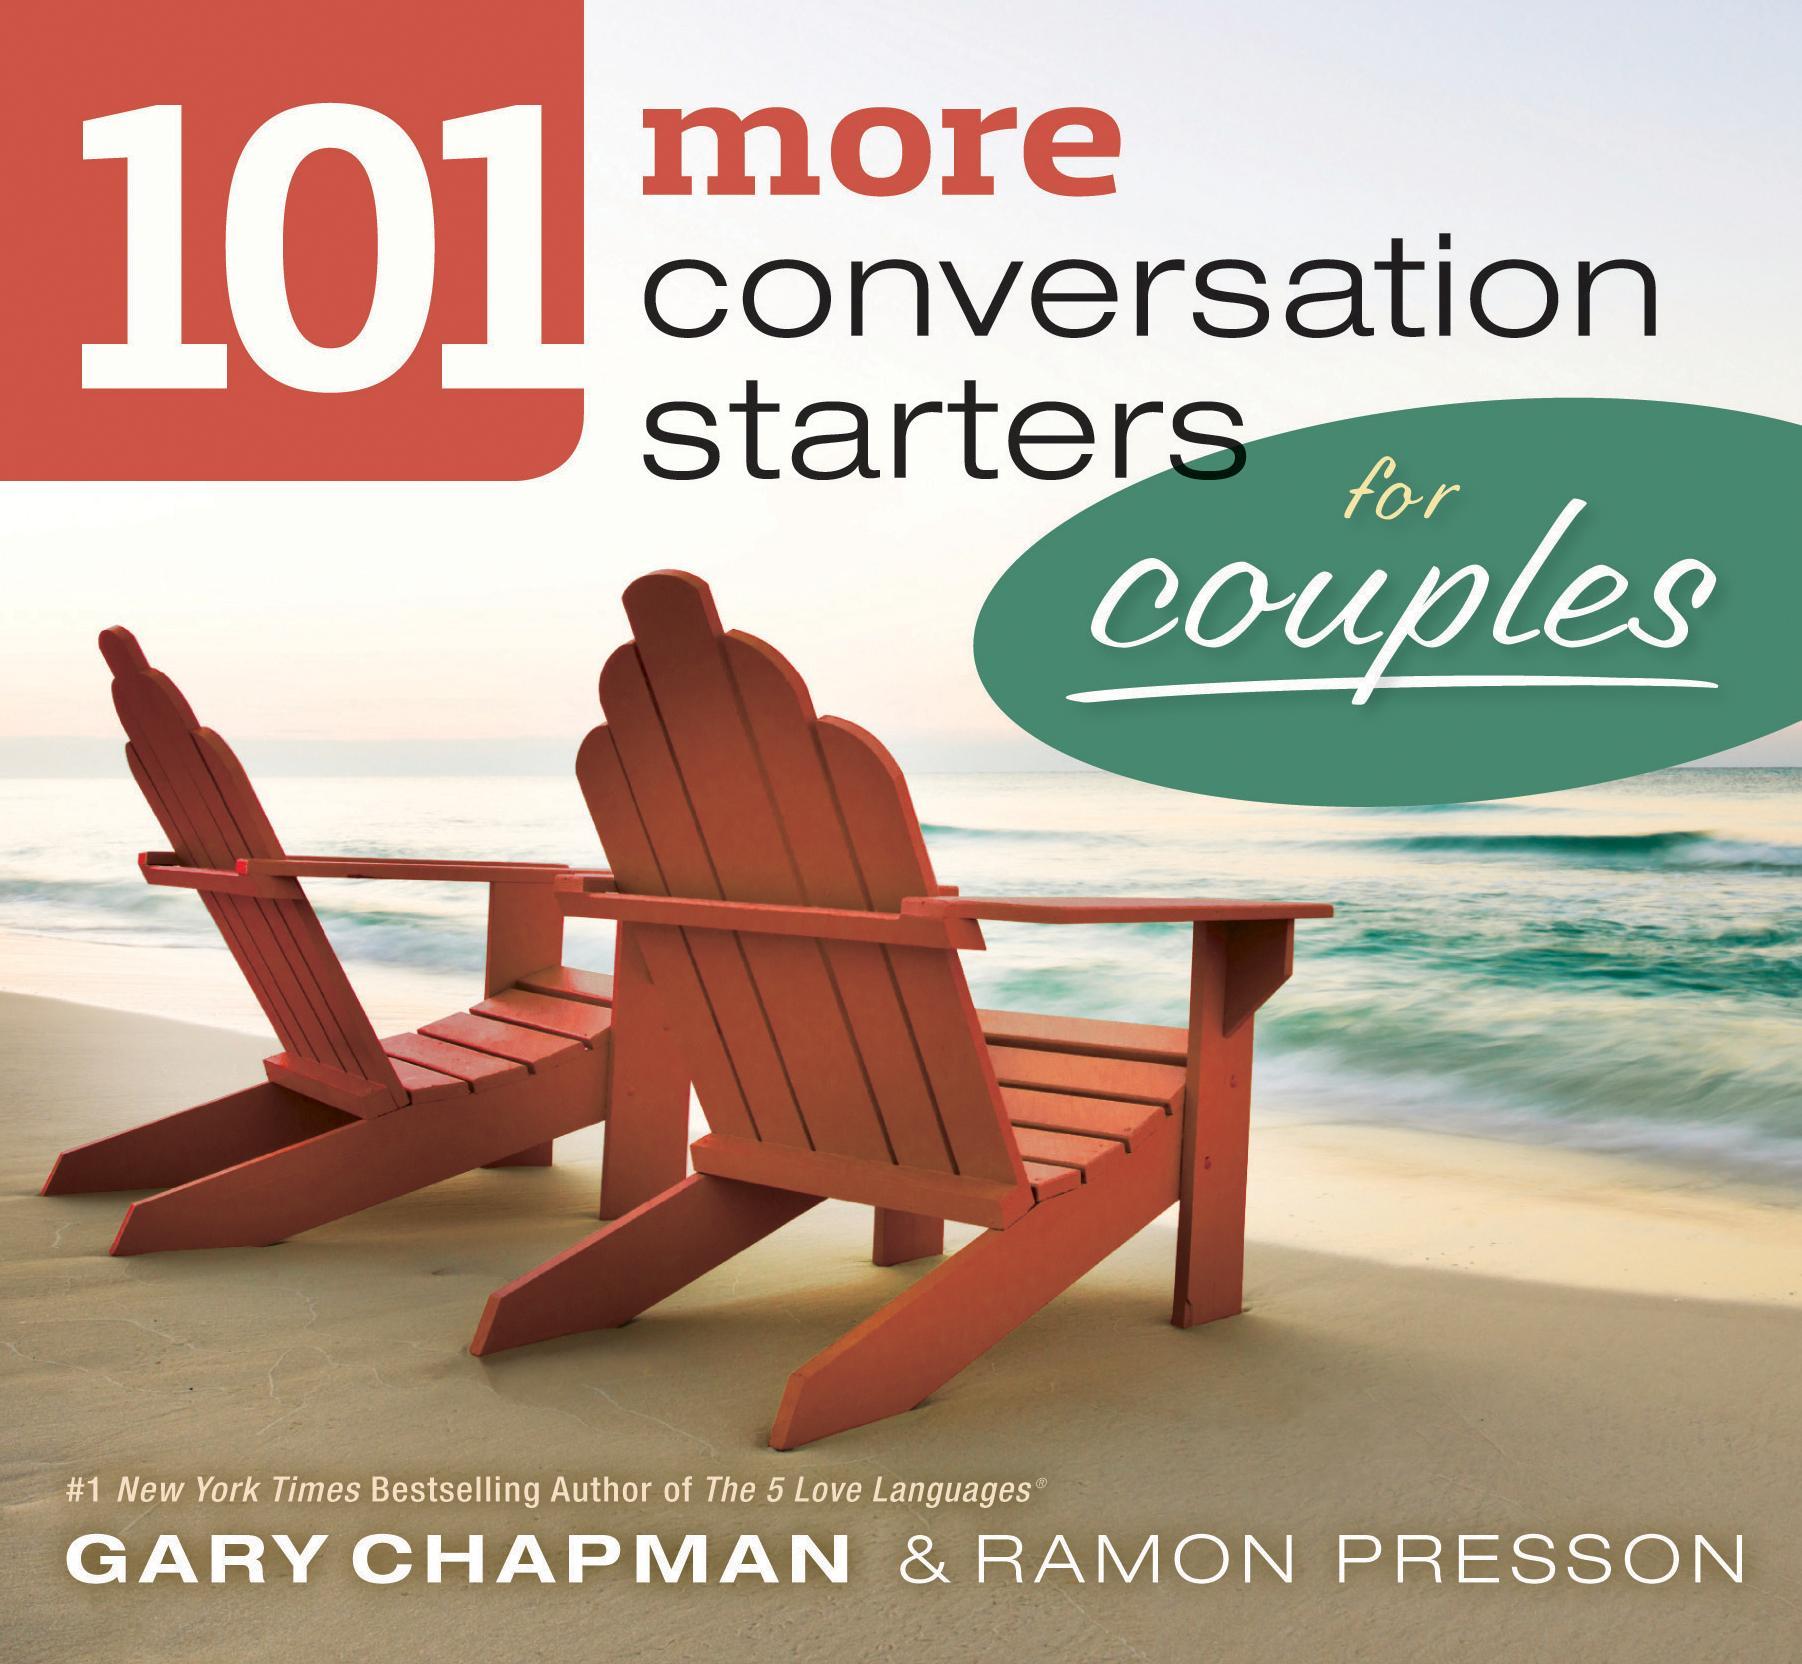 101 More Conversation Starters